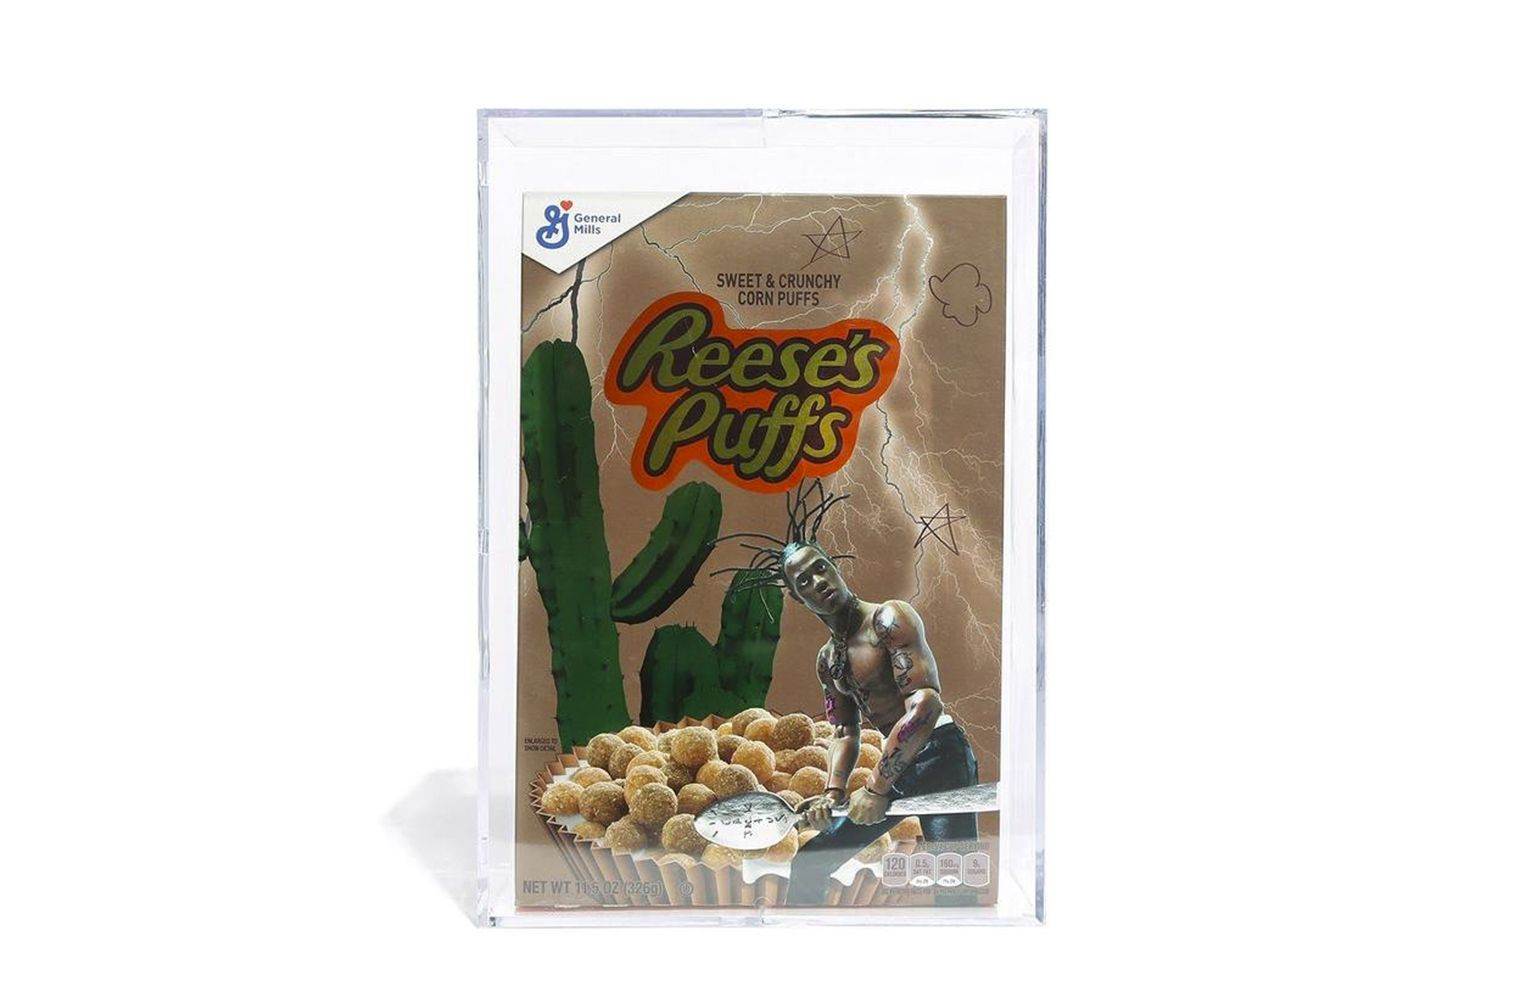 Travis Scott x Reese's Puffs